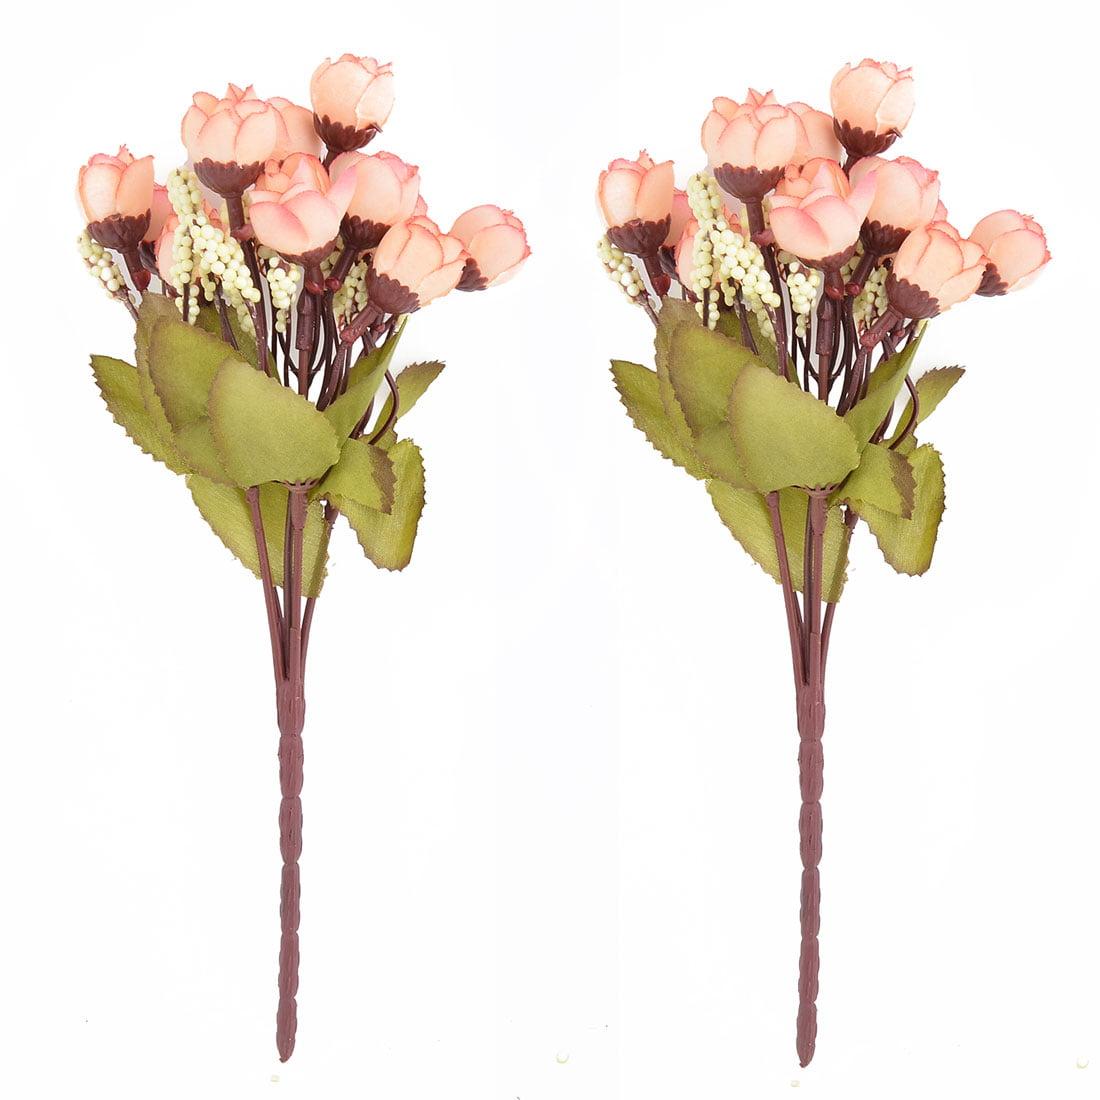 Fabric Rose Buds DIY Handhold Artificial Flower Bouquet Champagne Color 2pcs